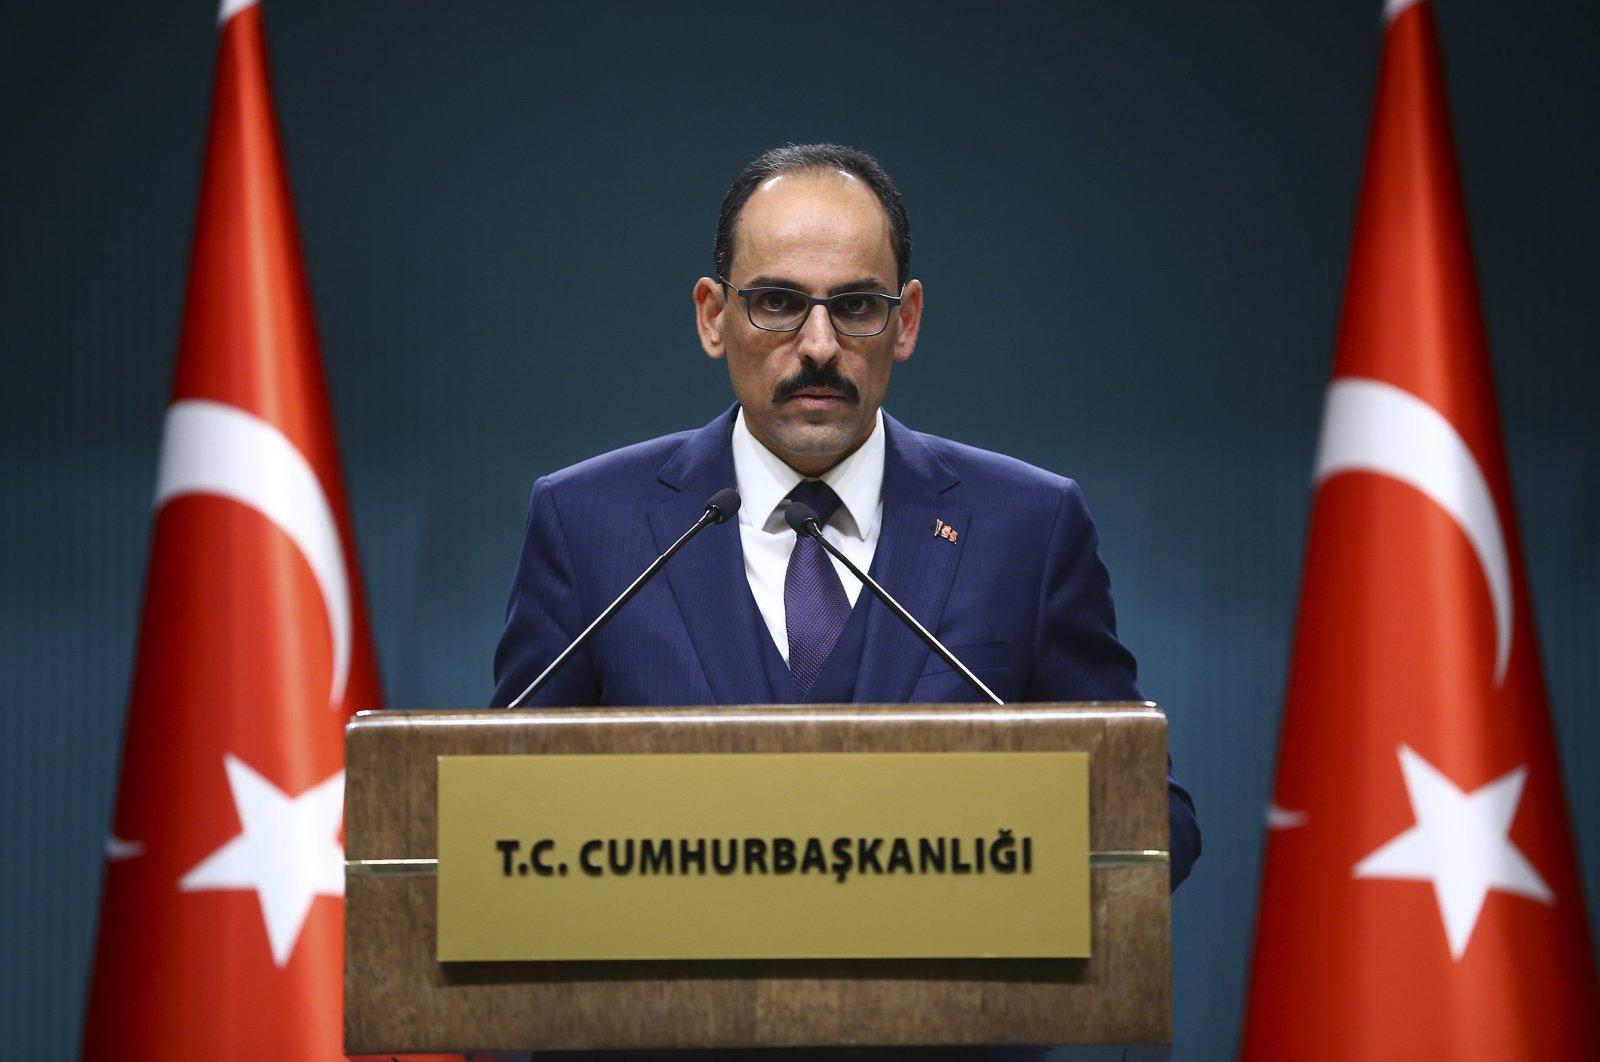 Presidential Spokesperson İbrahim Kalın speaks at a news conference in the capital Ankara, Turkey, Dec. 12, 2019. (AA File Photo)